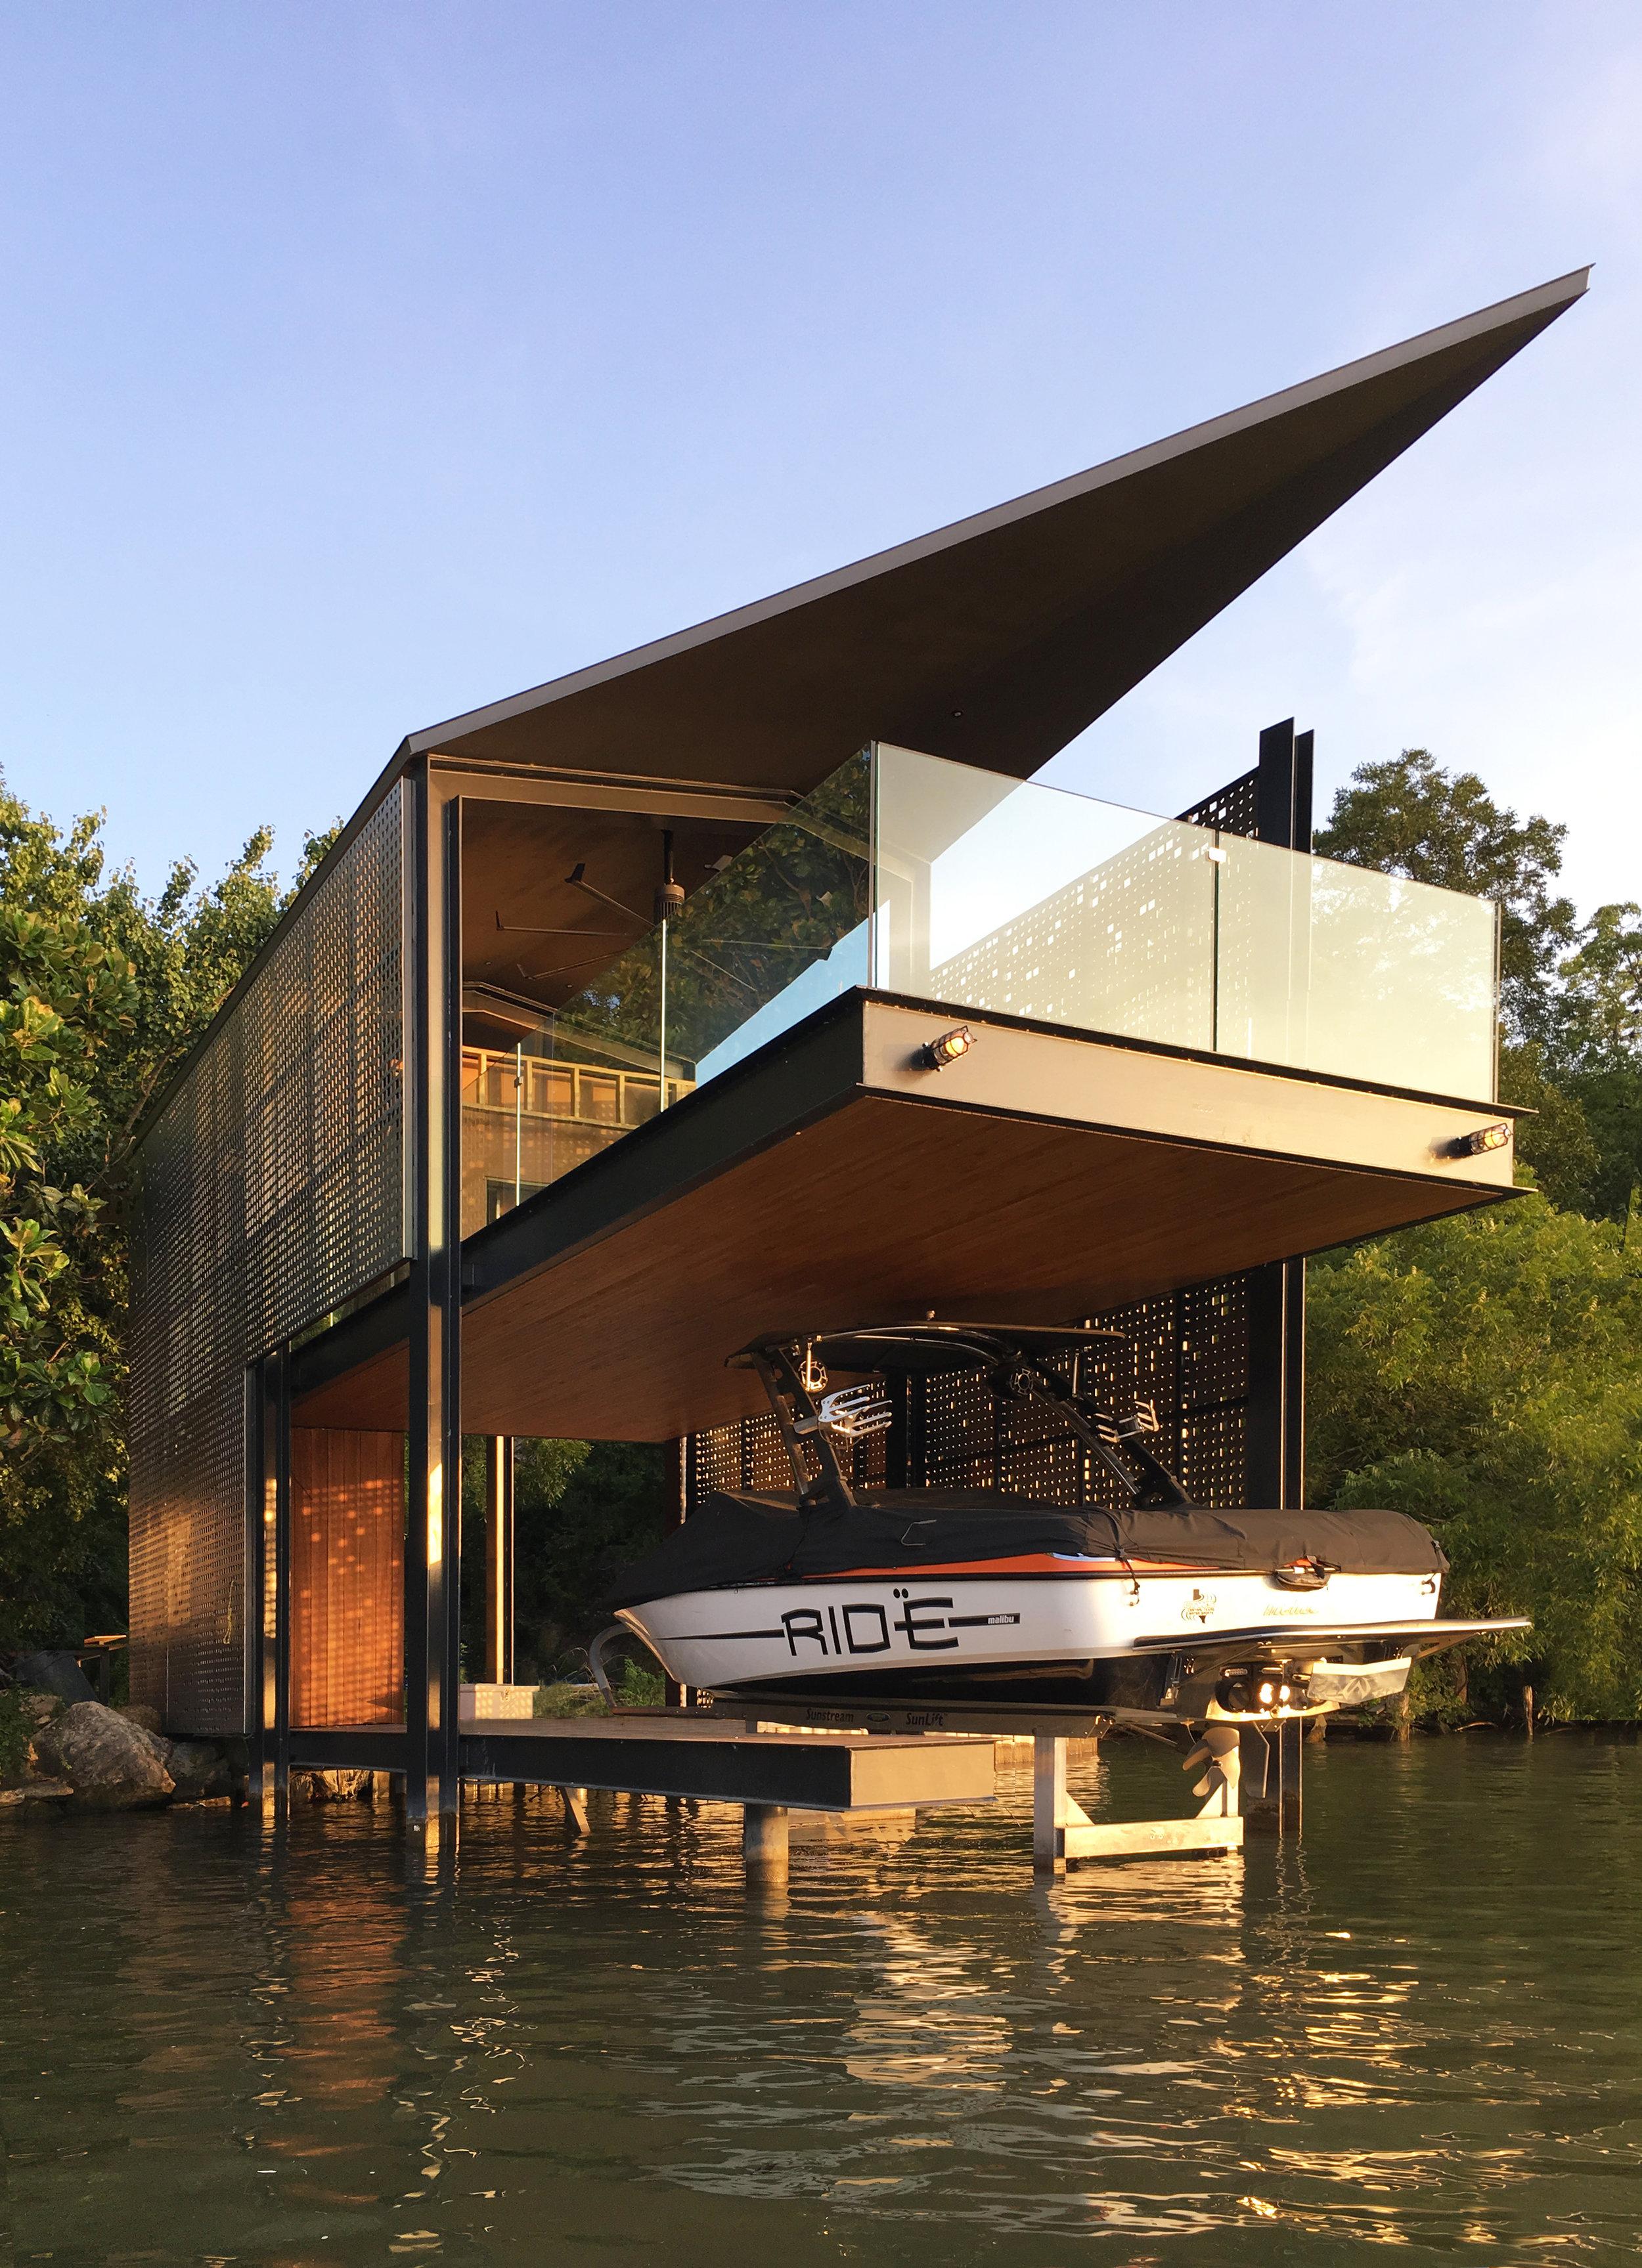 Filtered Frame Dock by Matt Fajkus Architecture. Photo by MF.jpg